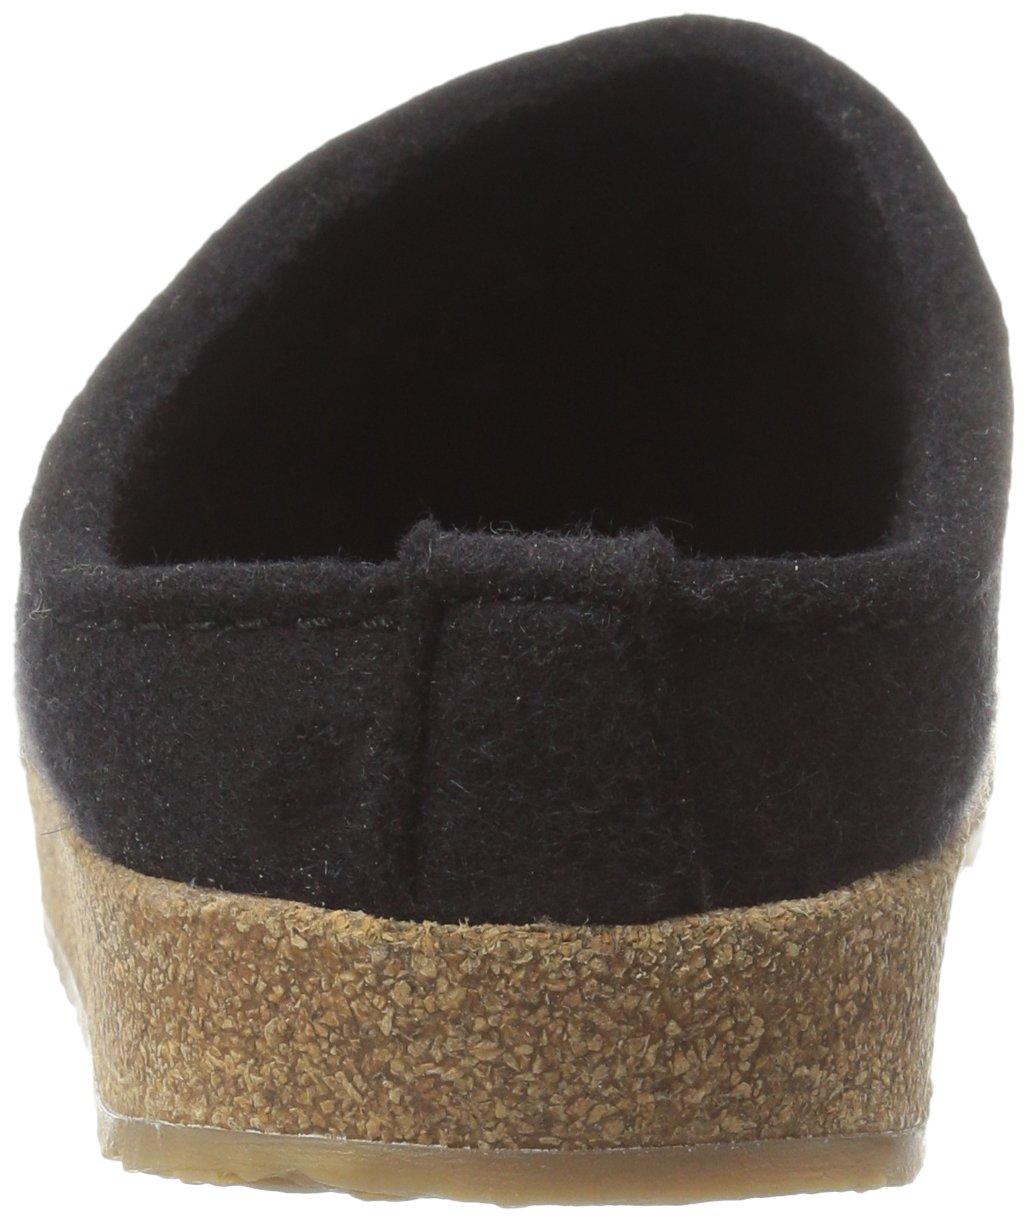 Haflinger Women's Gz Shopping Black Flat B01FDF9PJI 37 M EU / 6 B(M) US Black